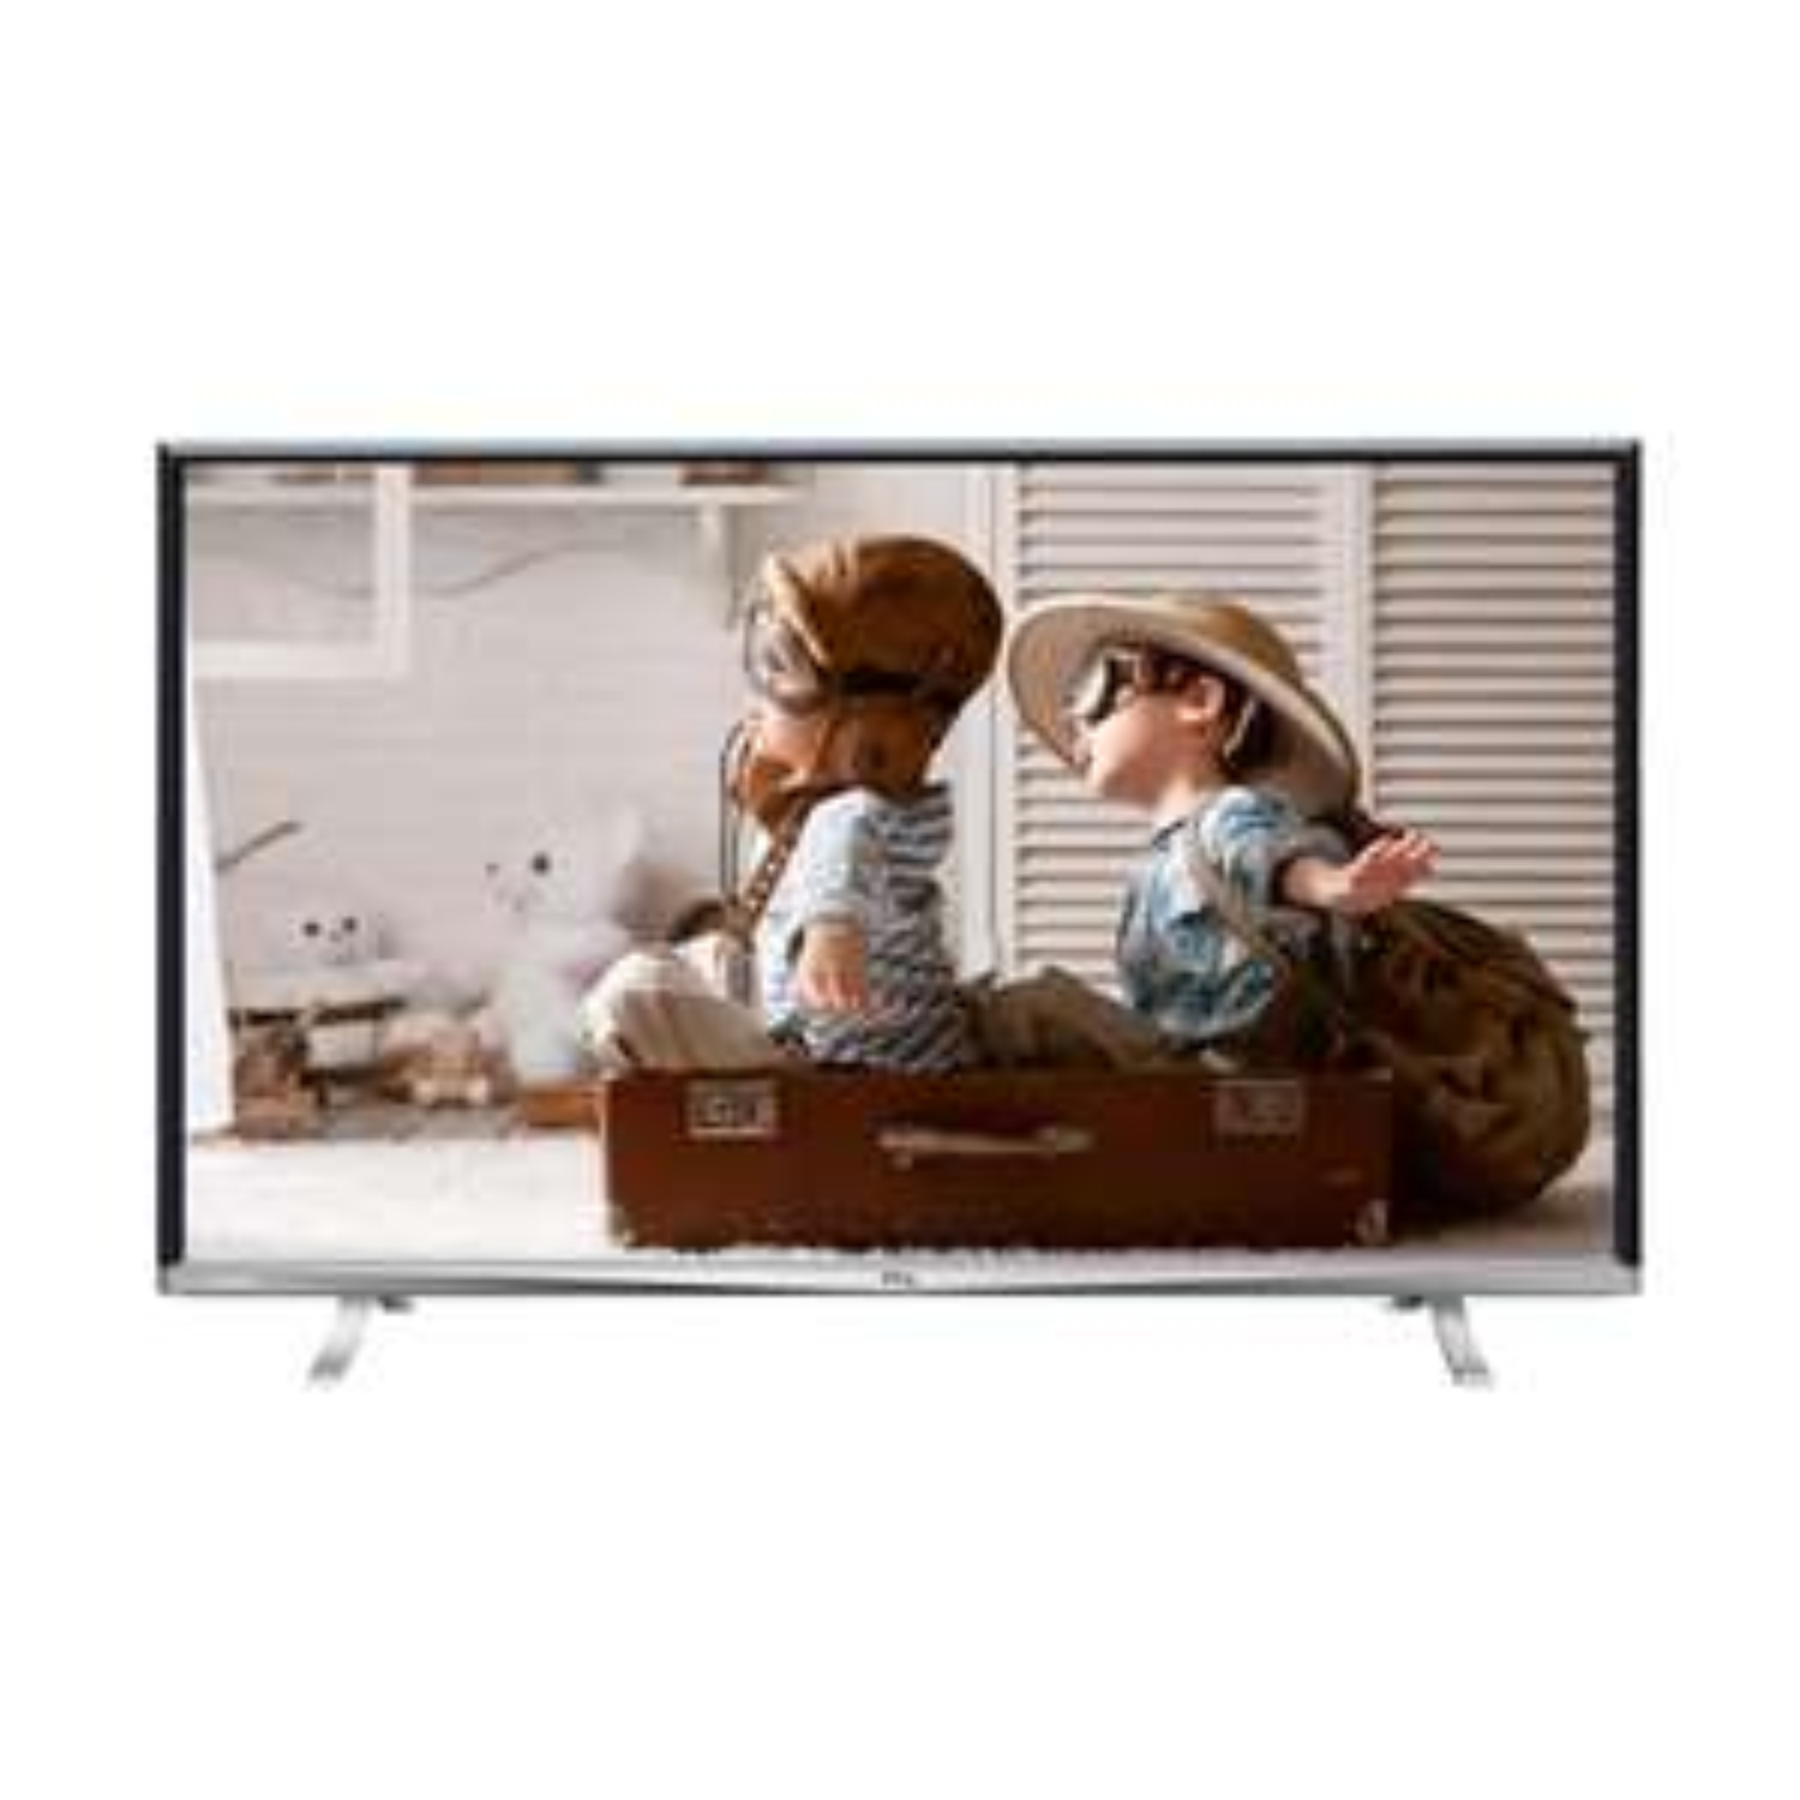 "El Palacio de Hierro: Pantalla TCL 32"" Led HD Smart TV"